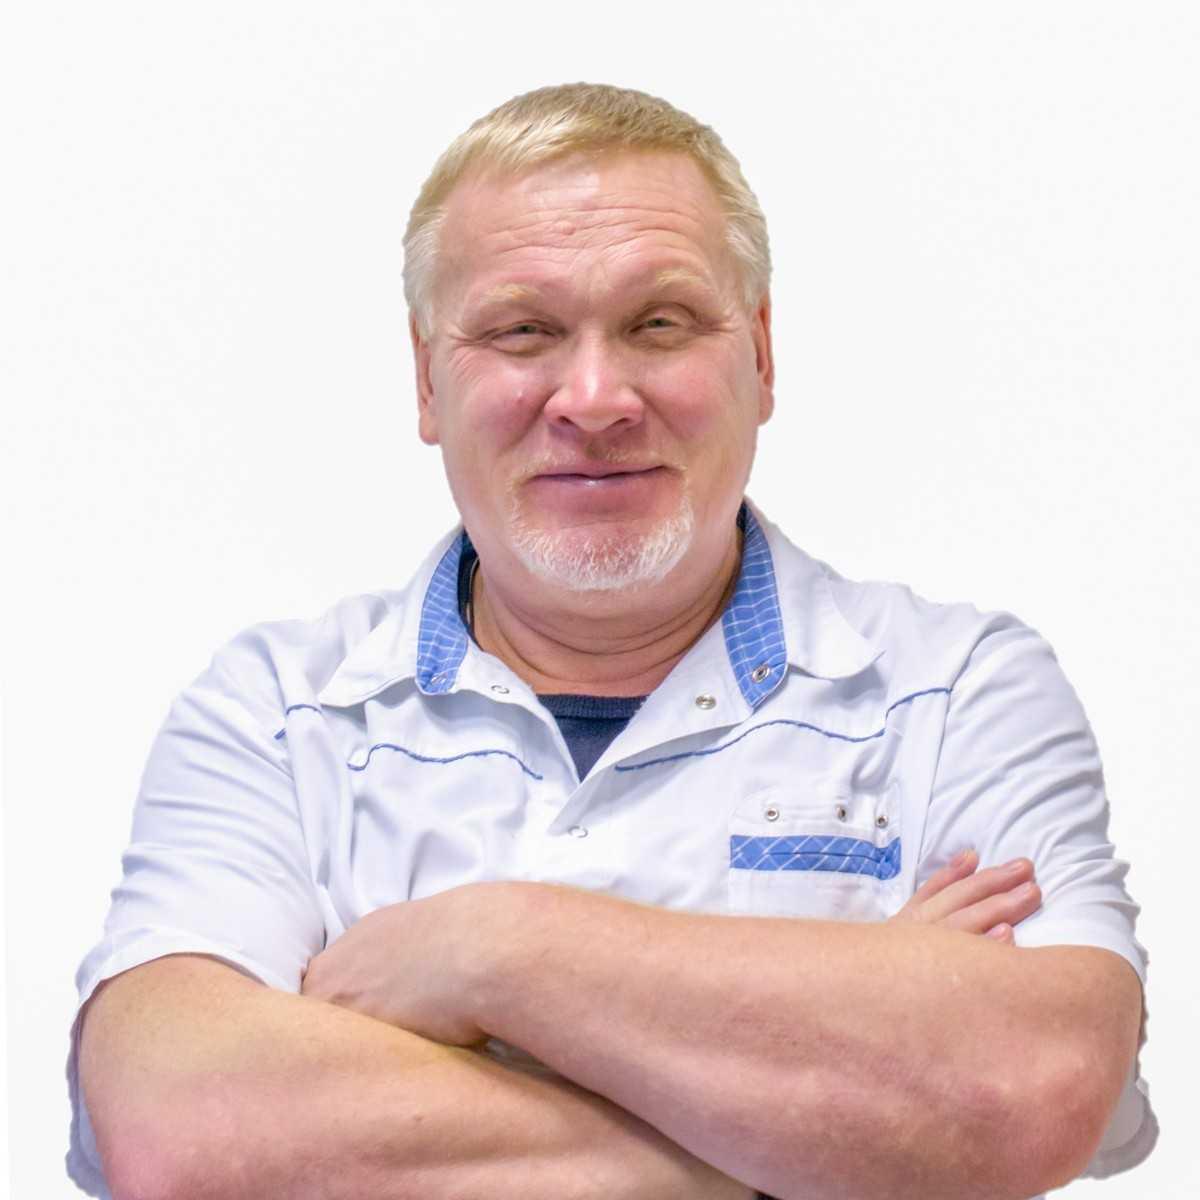 Костылев Юрий Александрович - фотография